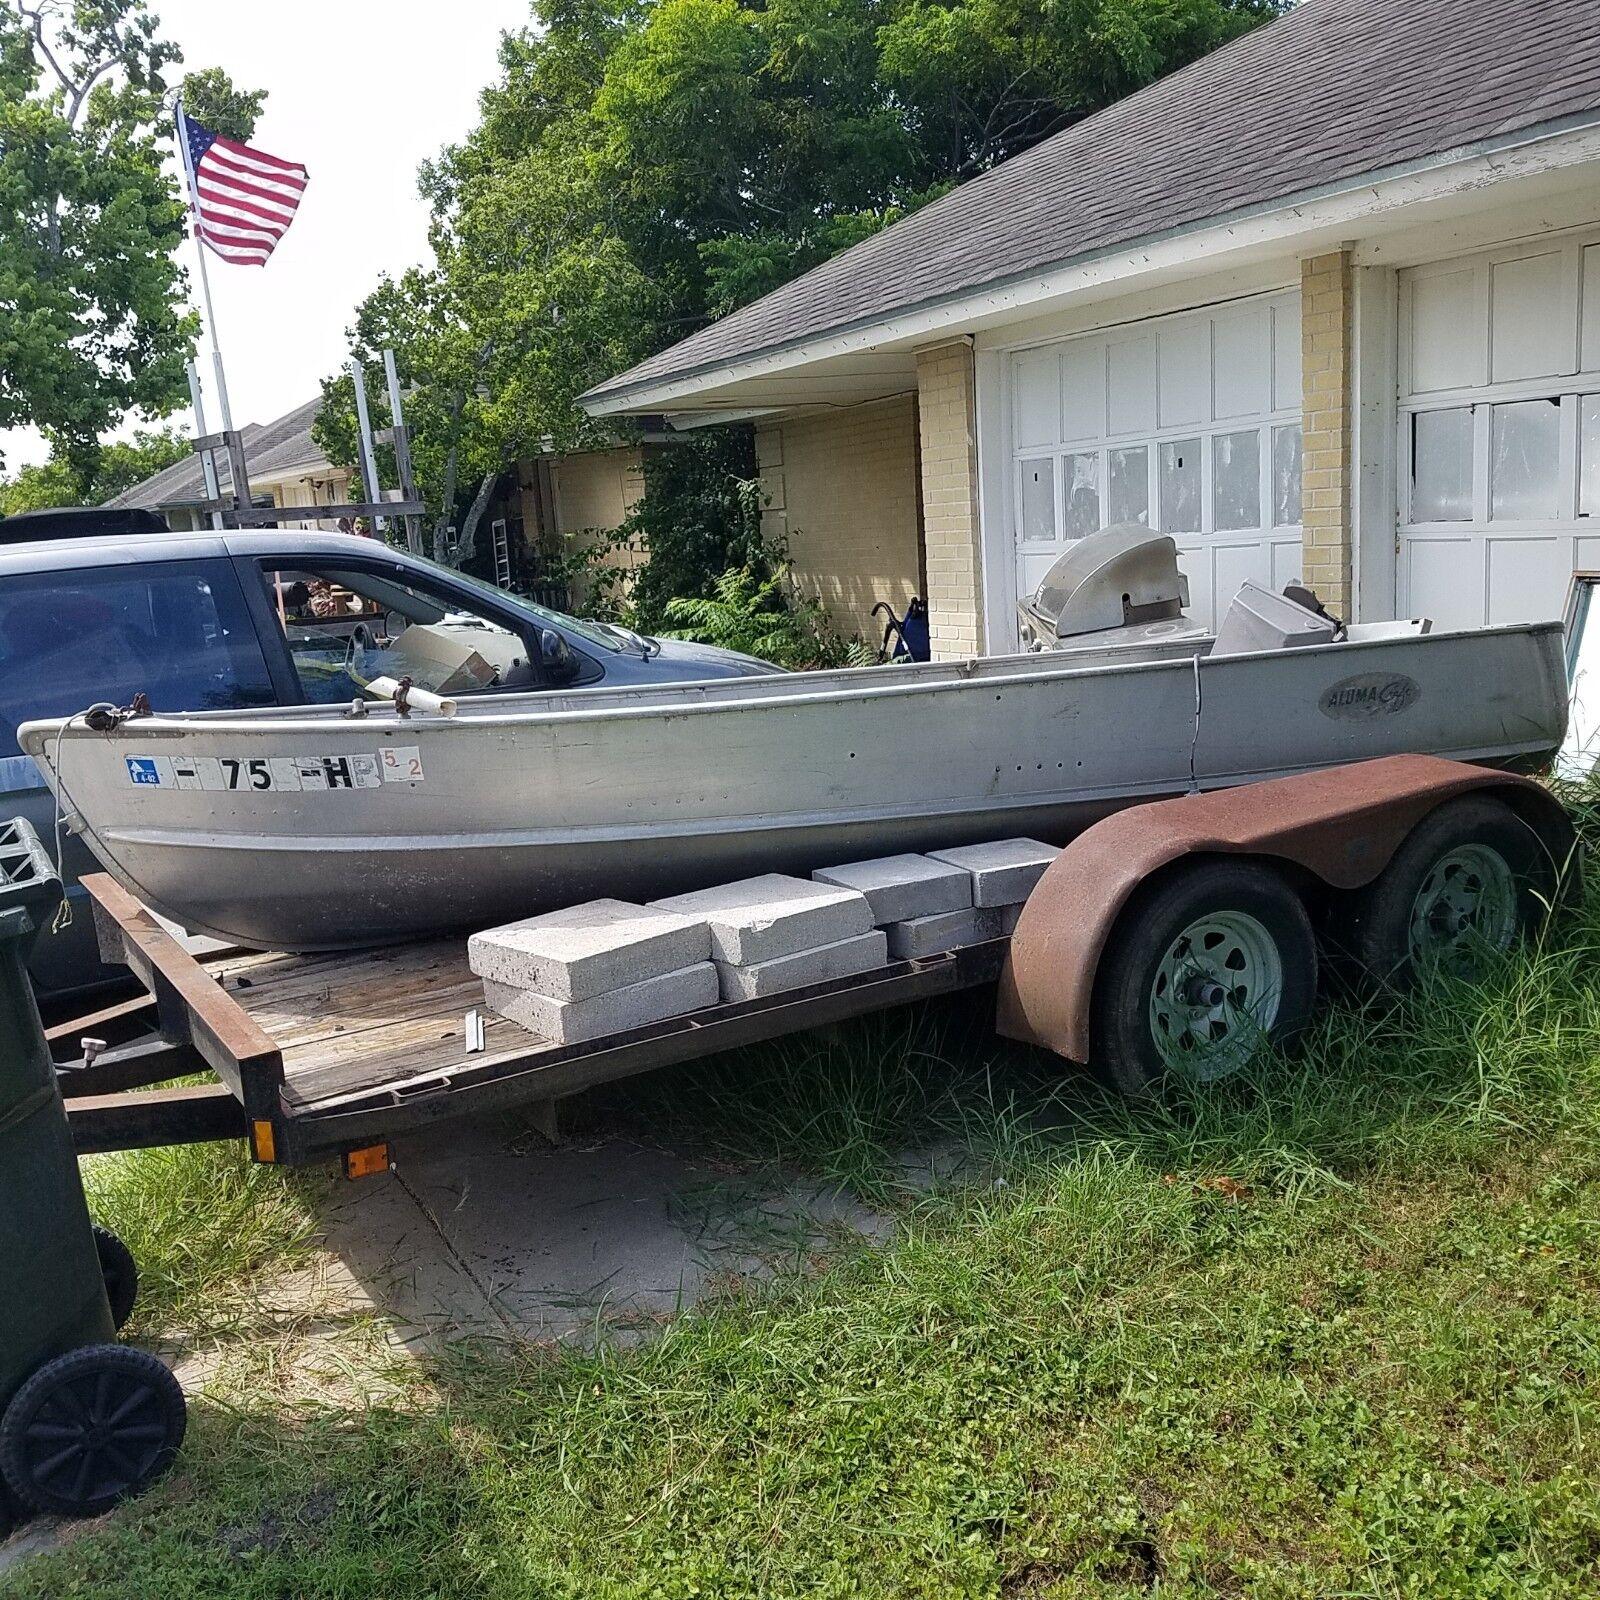 Aluma Craft 14 foot ALUMINUM FISHING row BOAT - no trailer included